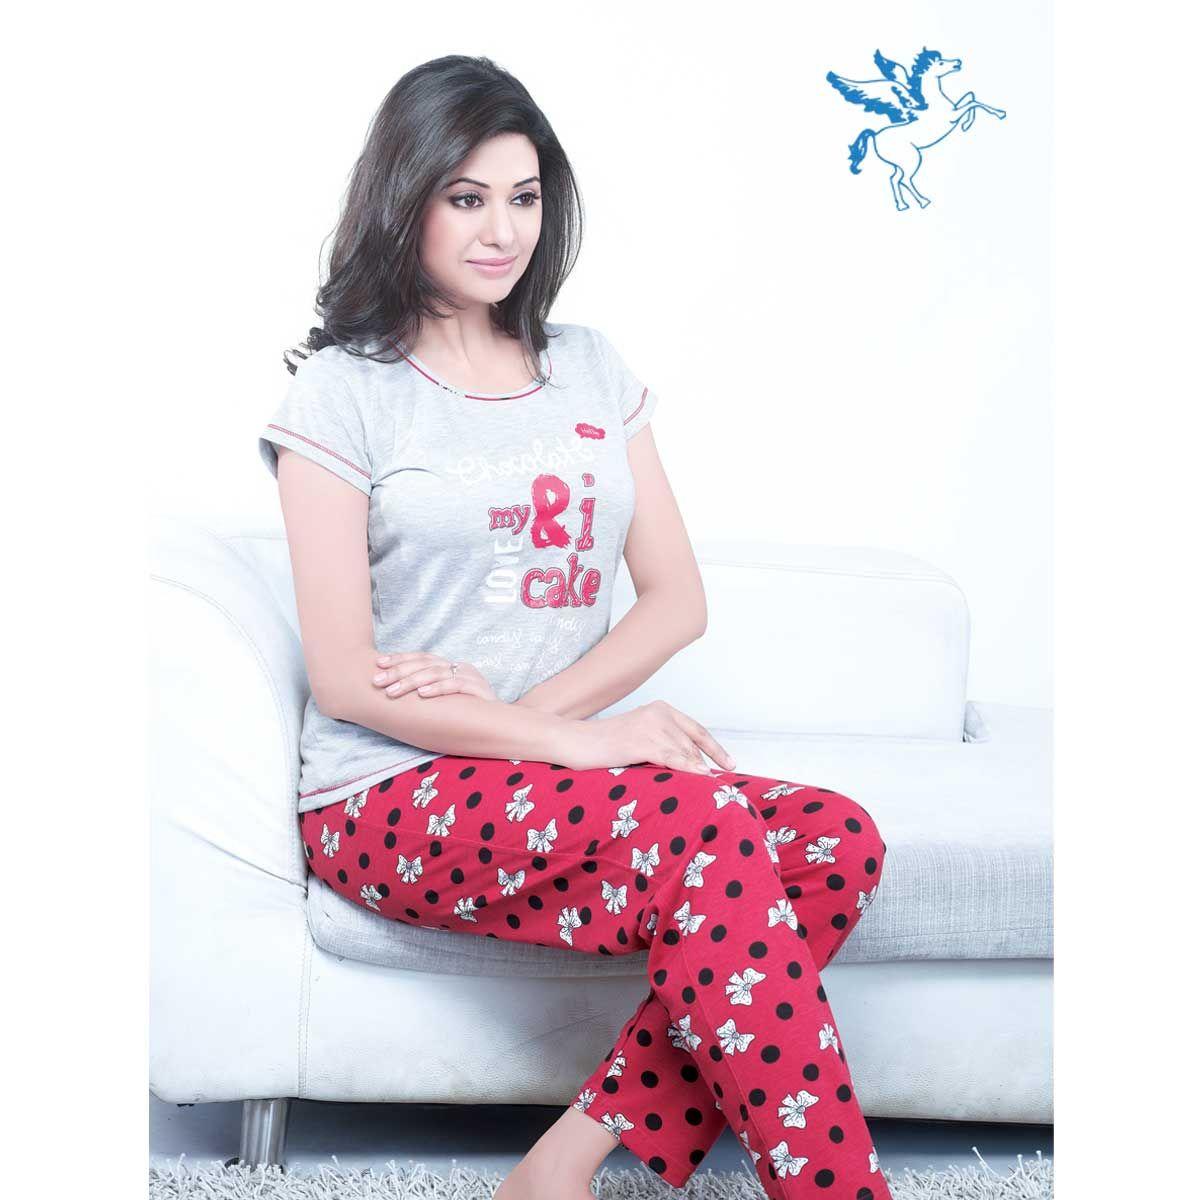 c9711d035 Juliet Night Suit - Pajamas and T-Shirt (JLPJ10763)